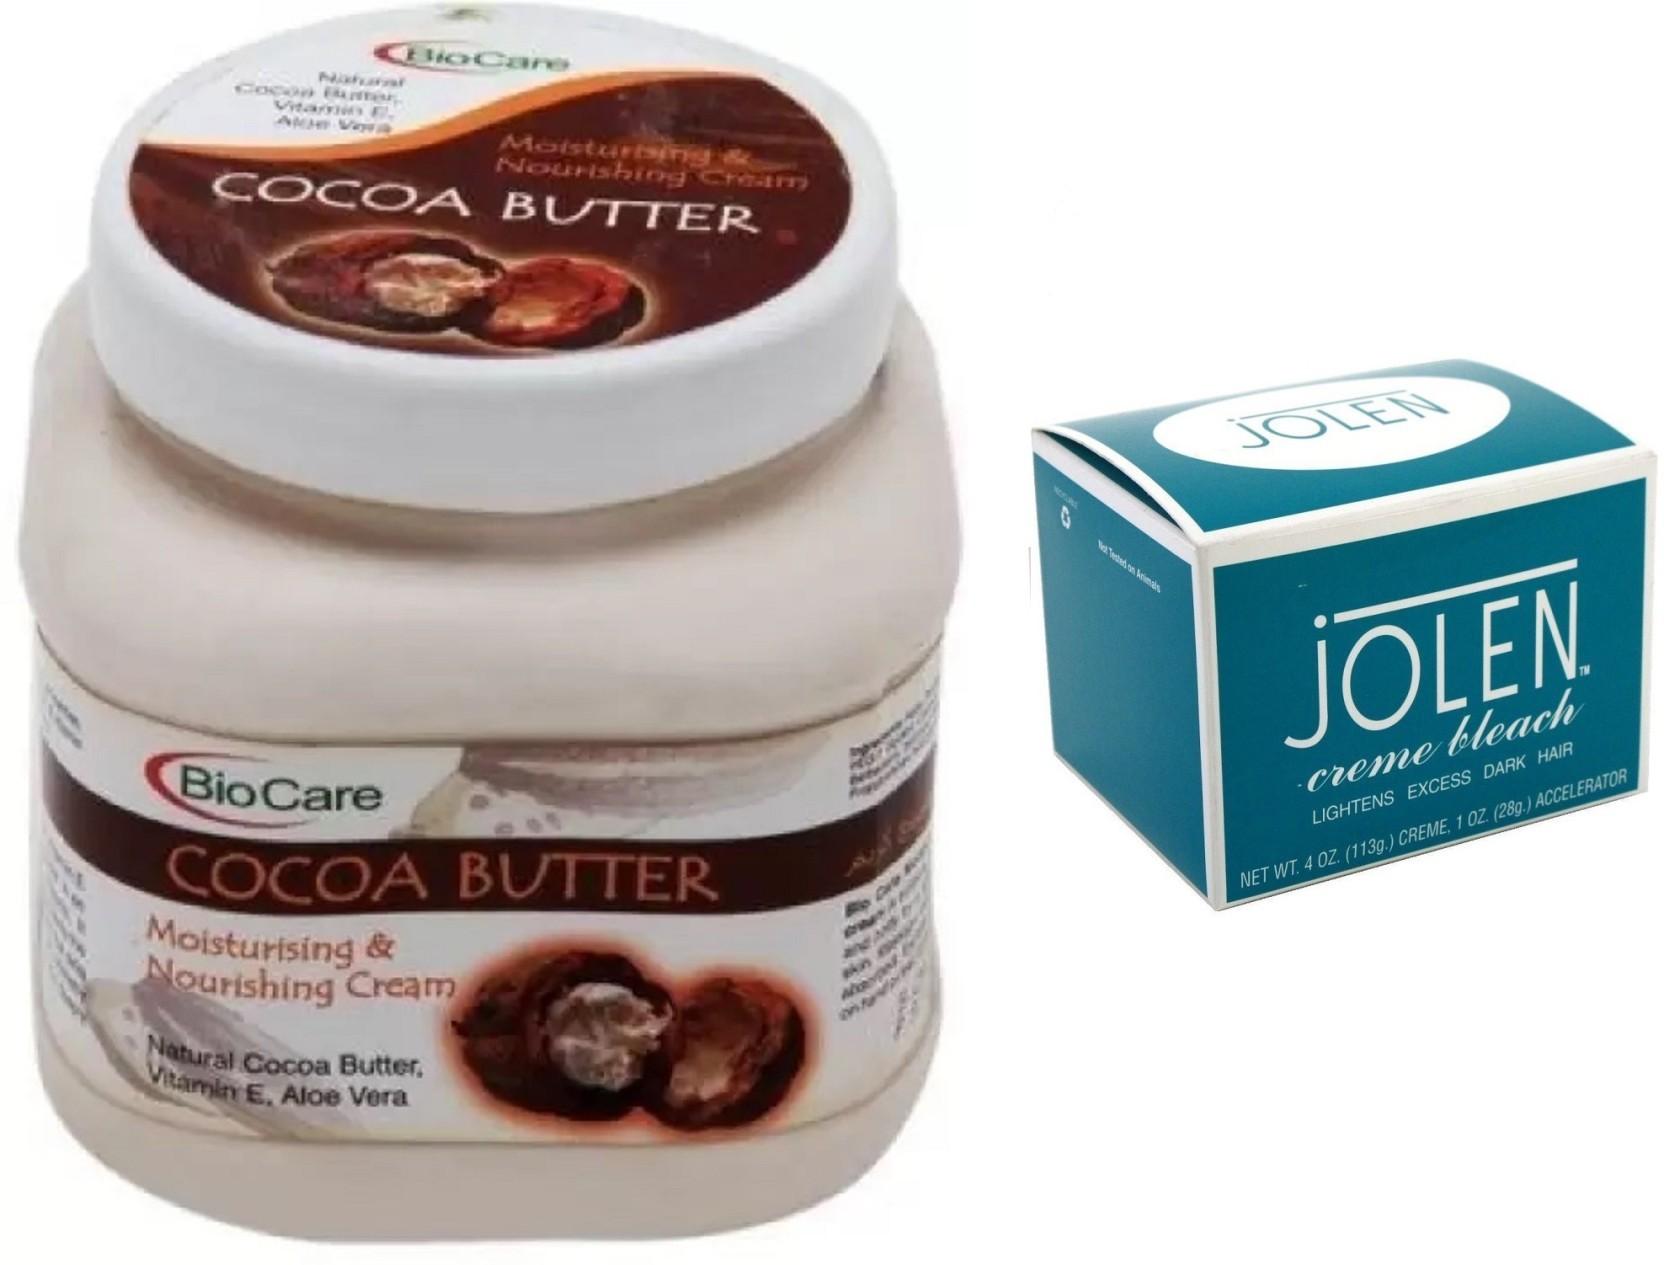 Jolen Crme Bleach And Biocare Cocoa Butter Cream 500ml Price In Cr Original Share